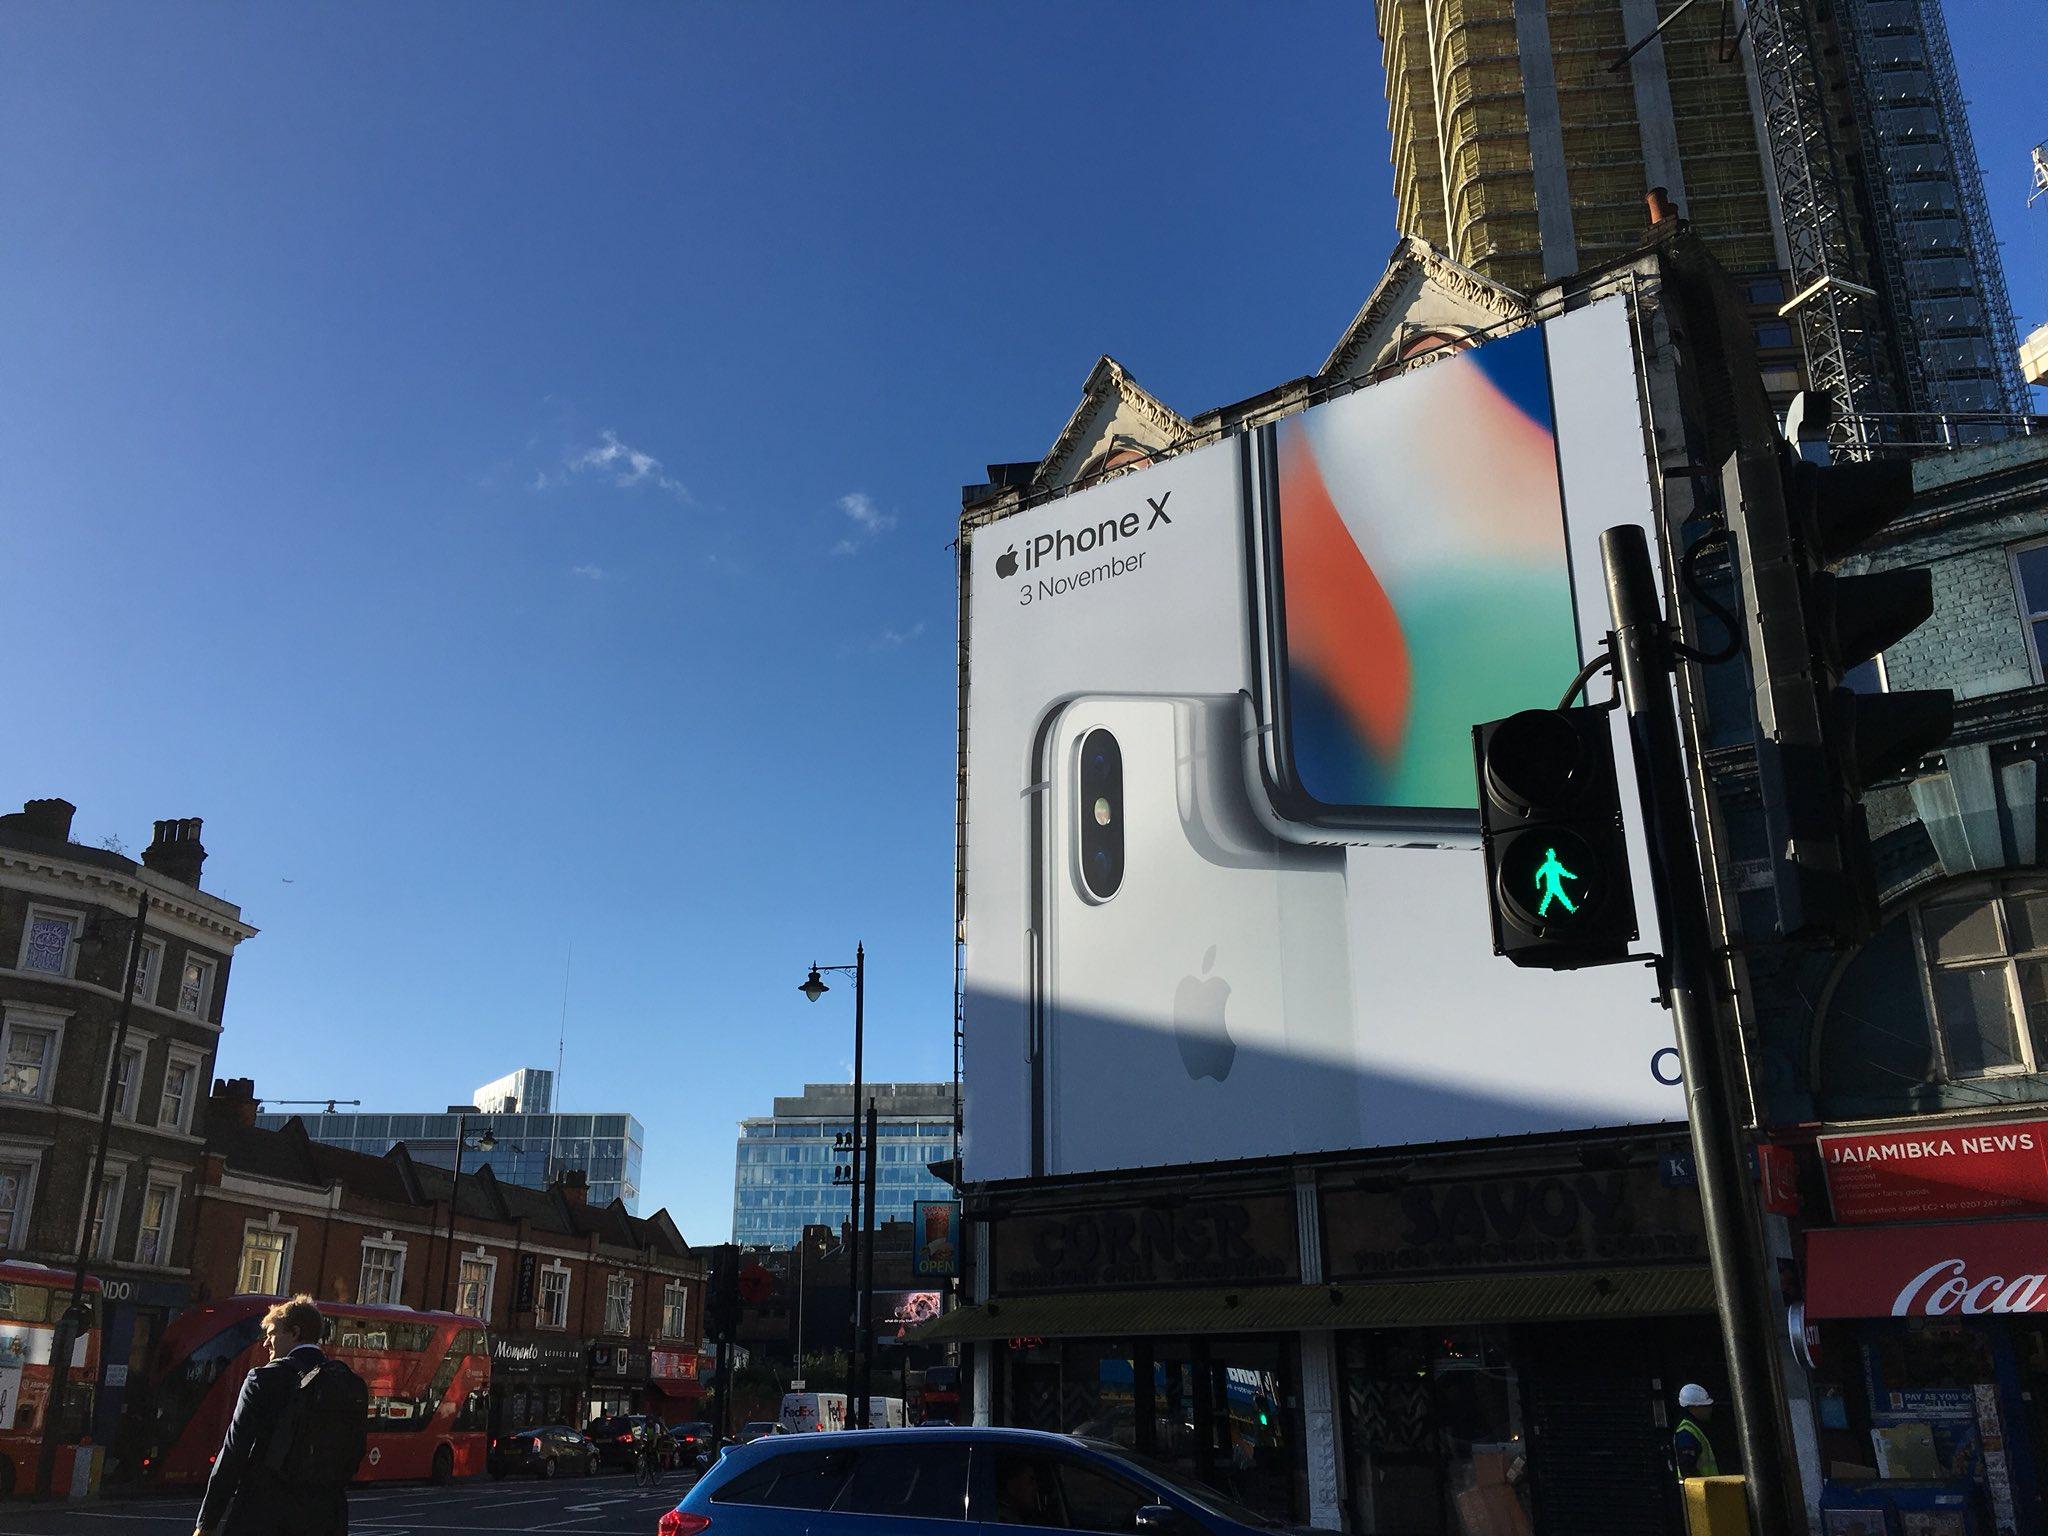 iPhone X apple promovare 3